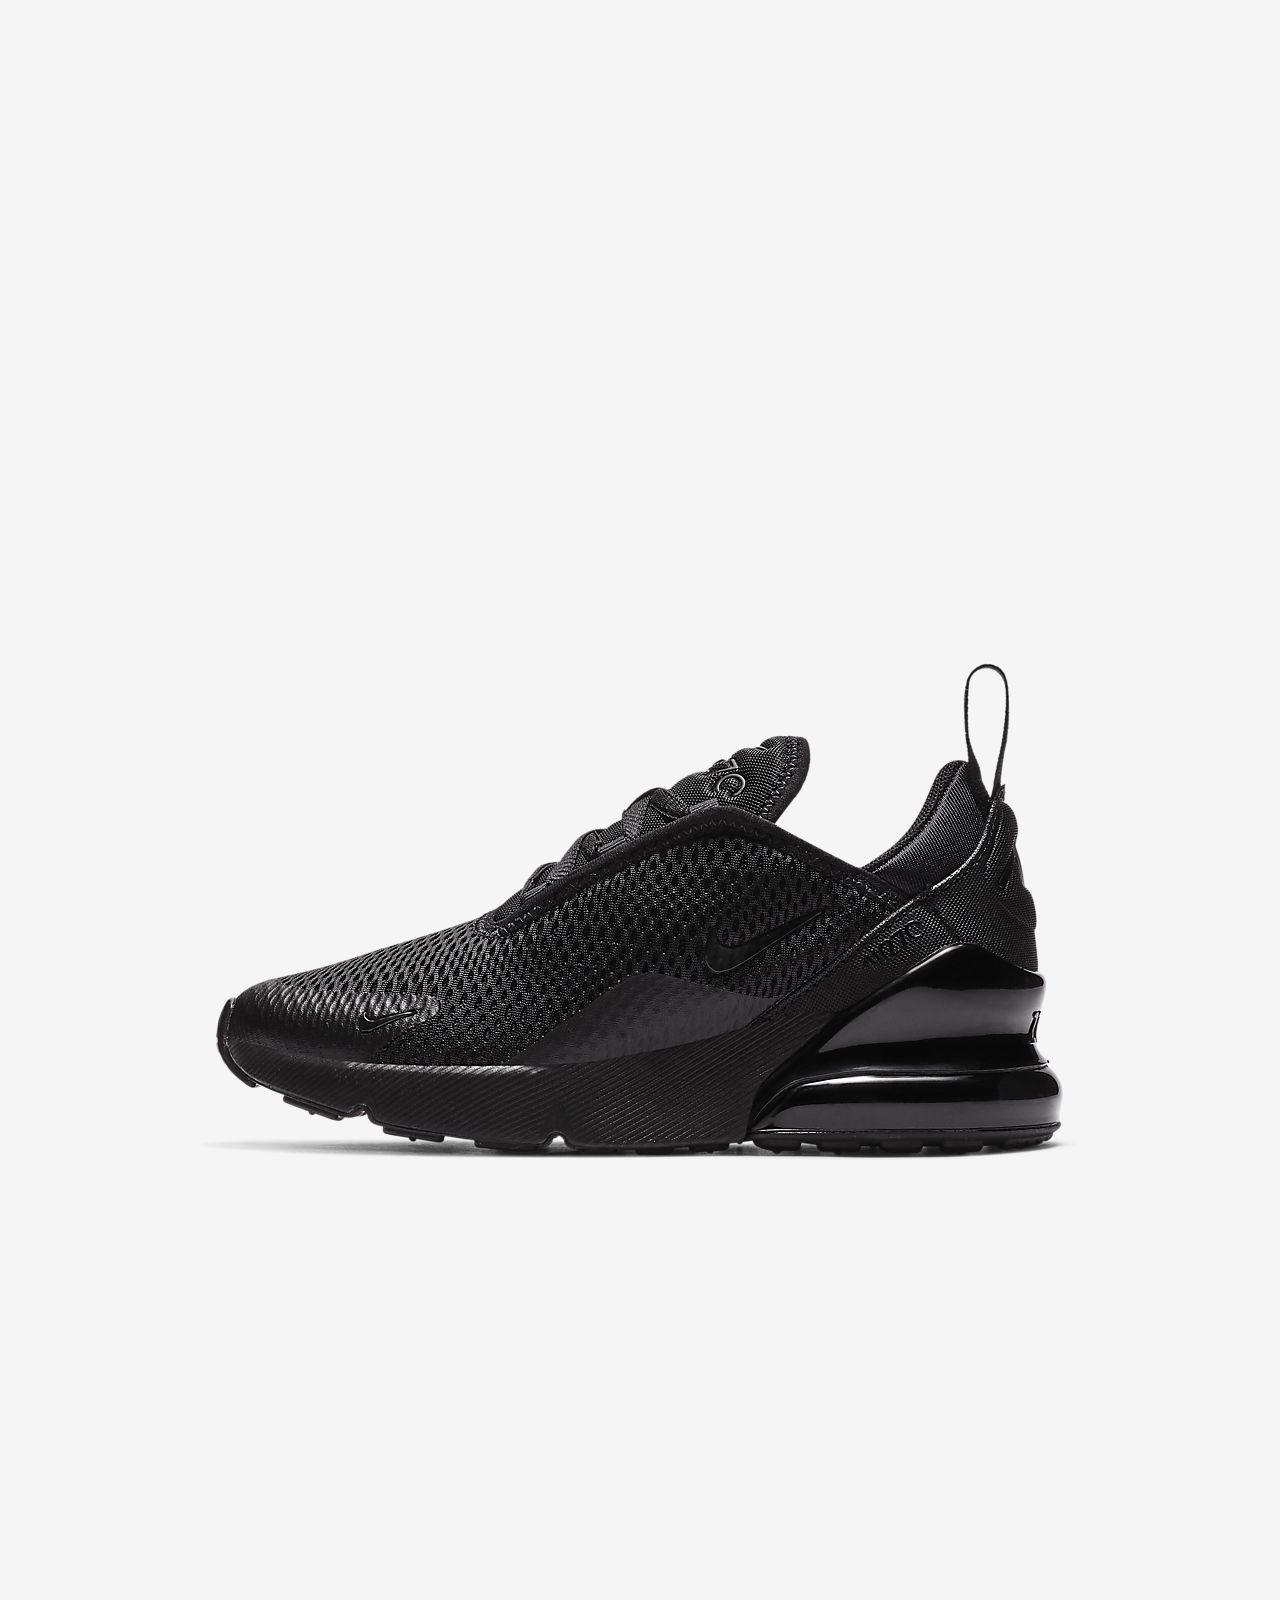 Nike Air Max 270 , Fiú Gyerek cipő   futócipő   nike   Nike